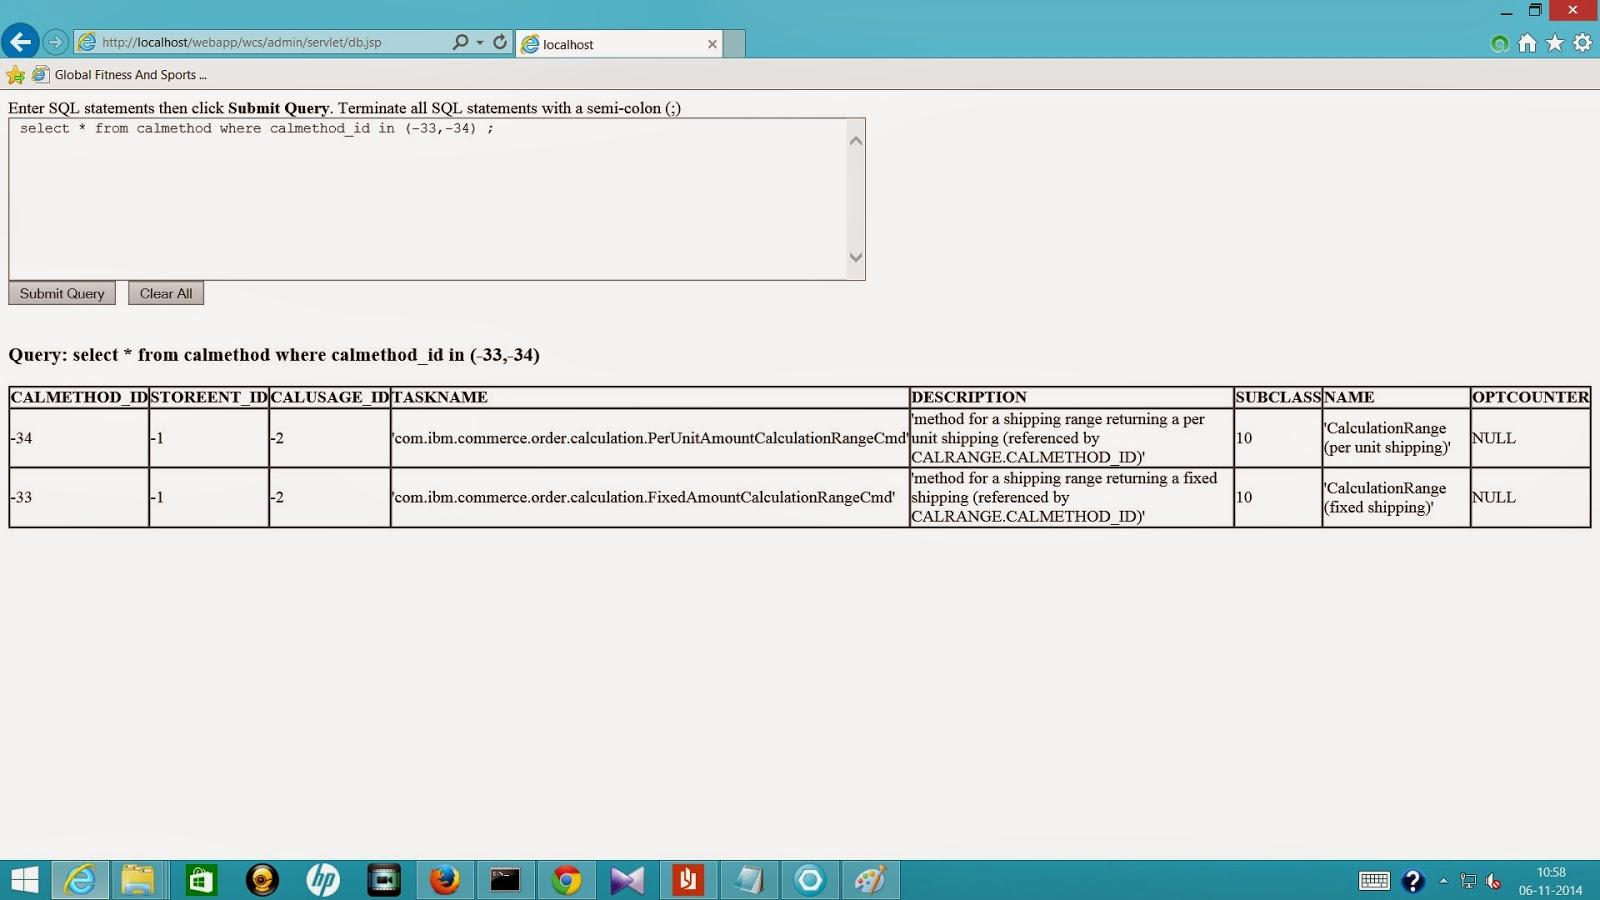 Websphere Commerce CALMETHOD table